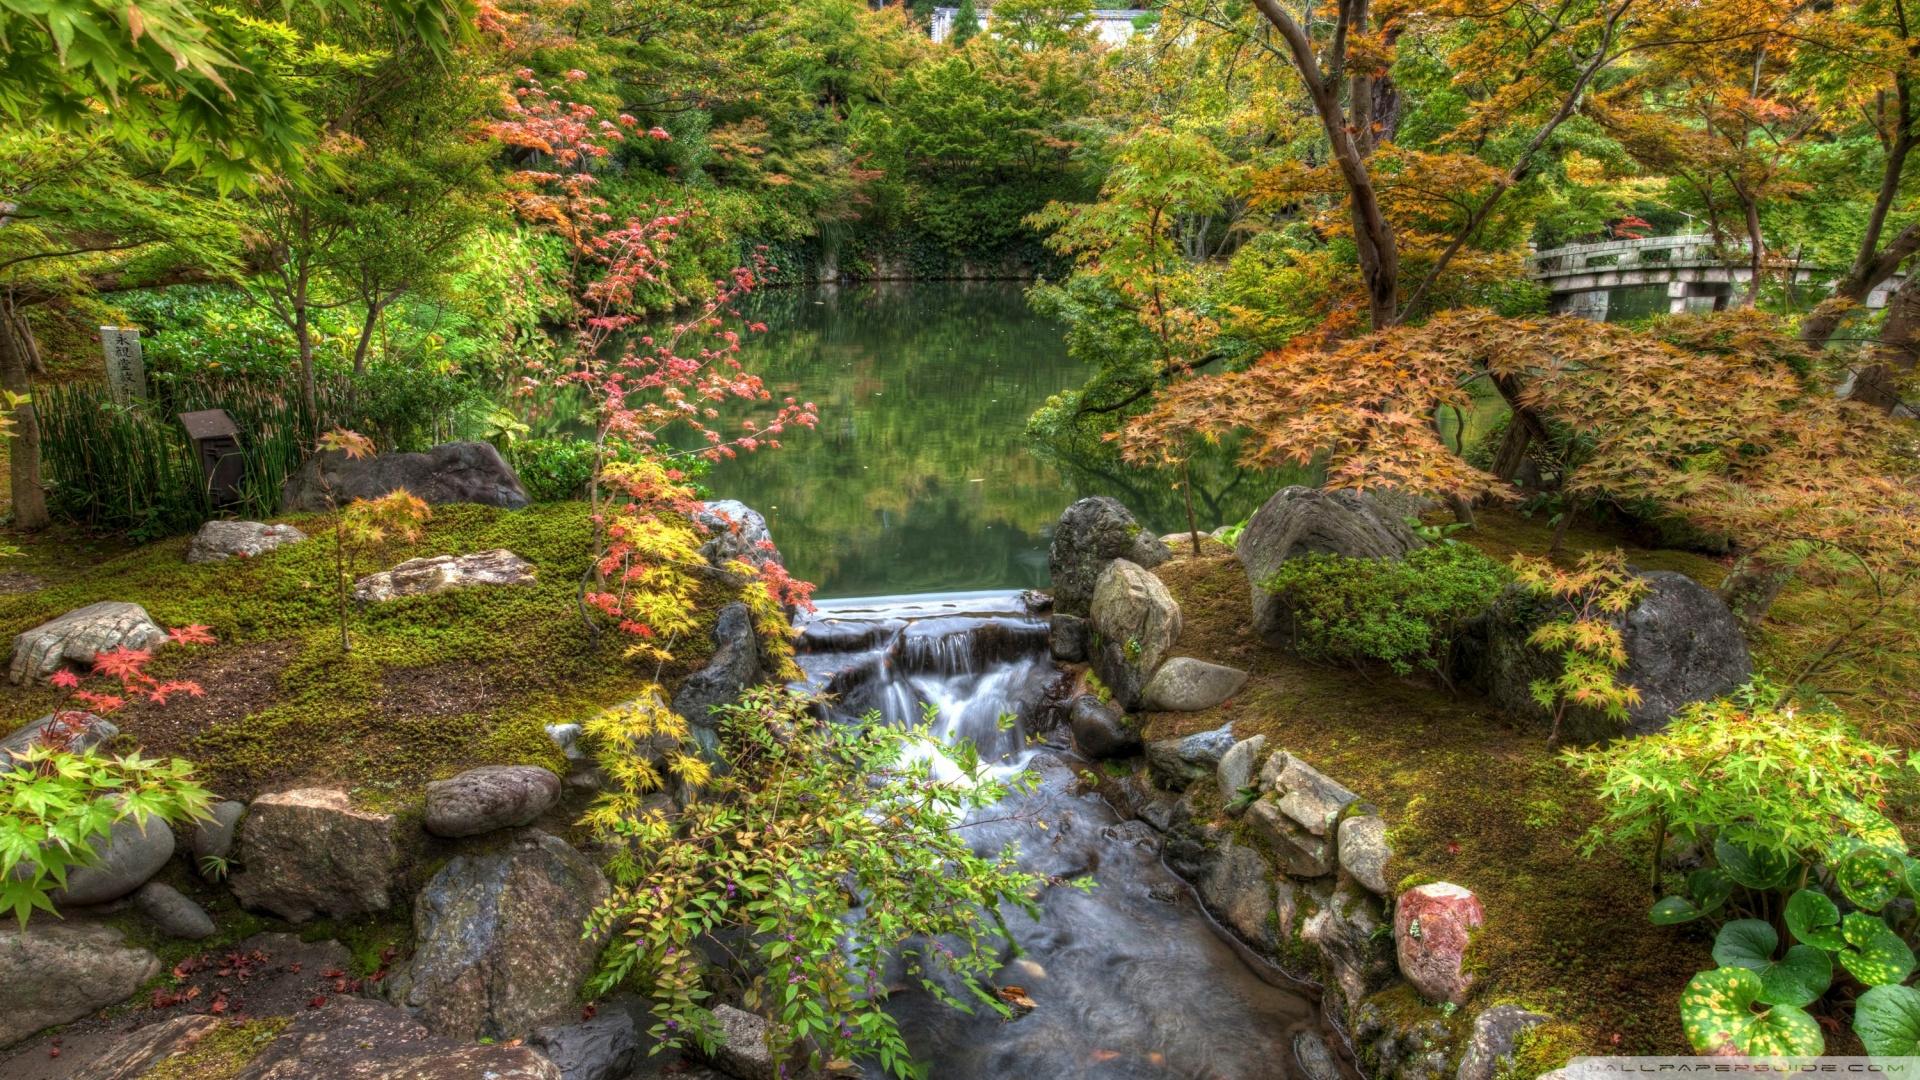 Japanese Garden 3 Wallpaper 1920x1080 Japanese Garden 3 1920x1080